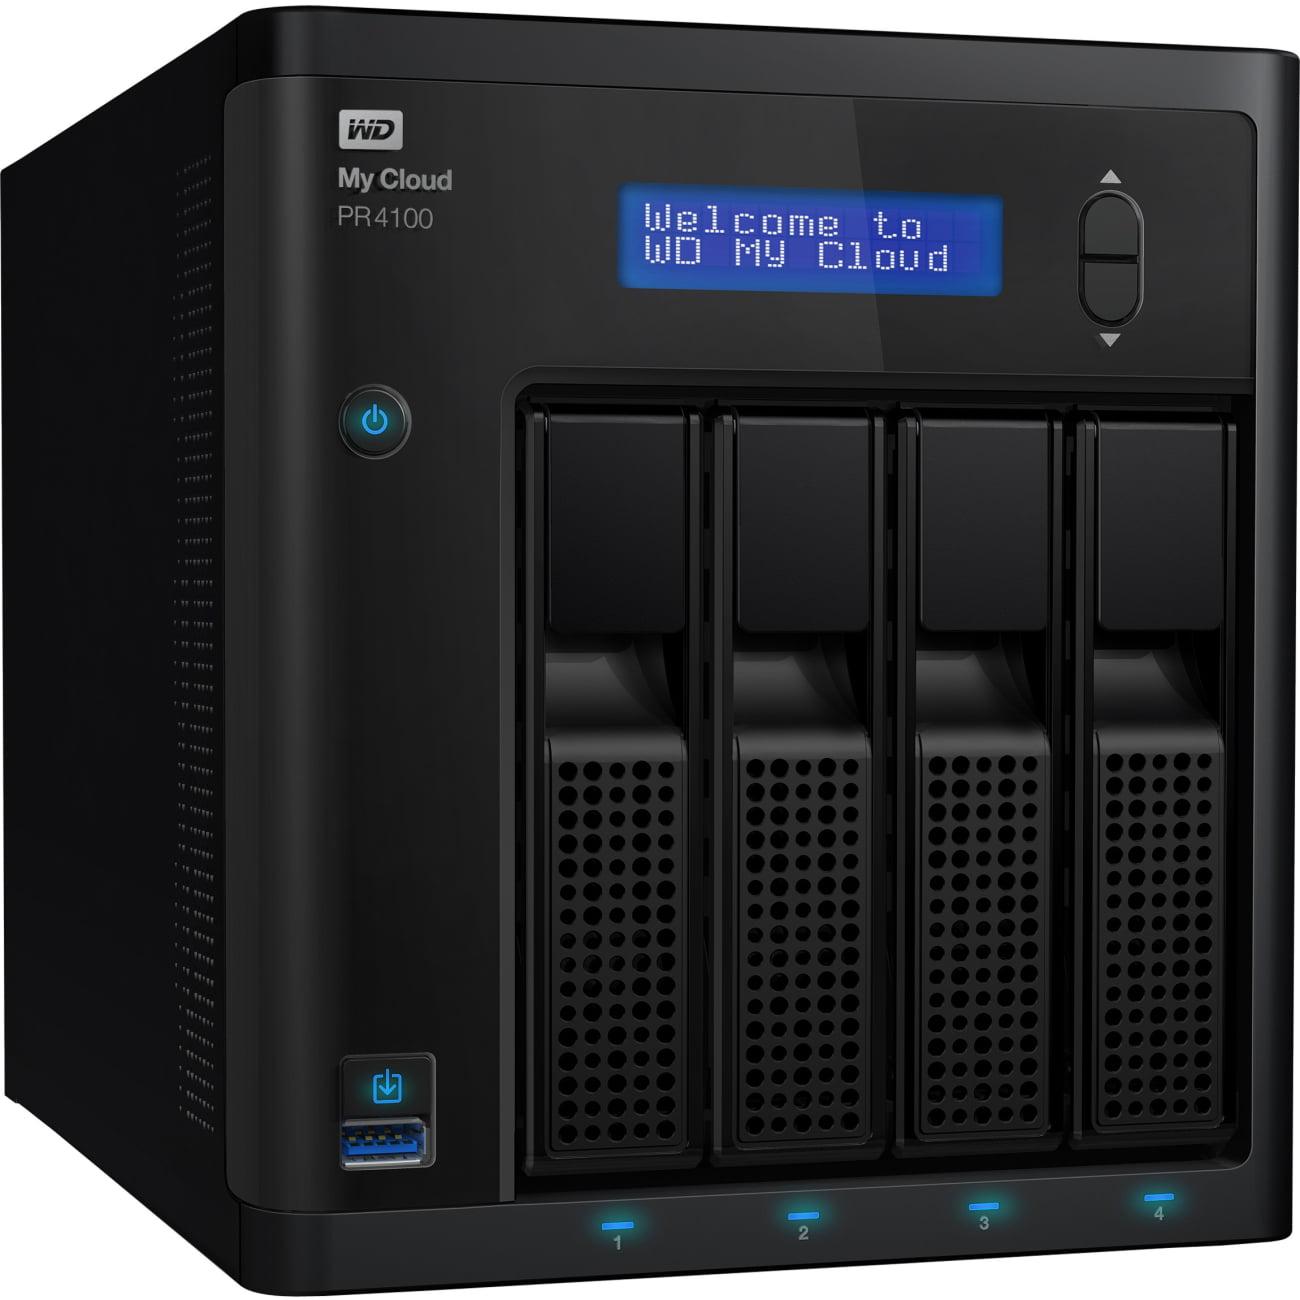 Wd 8tb My Cloud Pr4100 Pro Series Media Server With Transcoding, Nas - Network Attached Storage - Intel Pentium N3710 Quad-core [4 Core] 1.60 Ghz - 4 X Total Bays - 8 Tb Hdd - 4 (wdbnfa0080kbk-nesn)